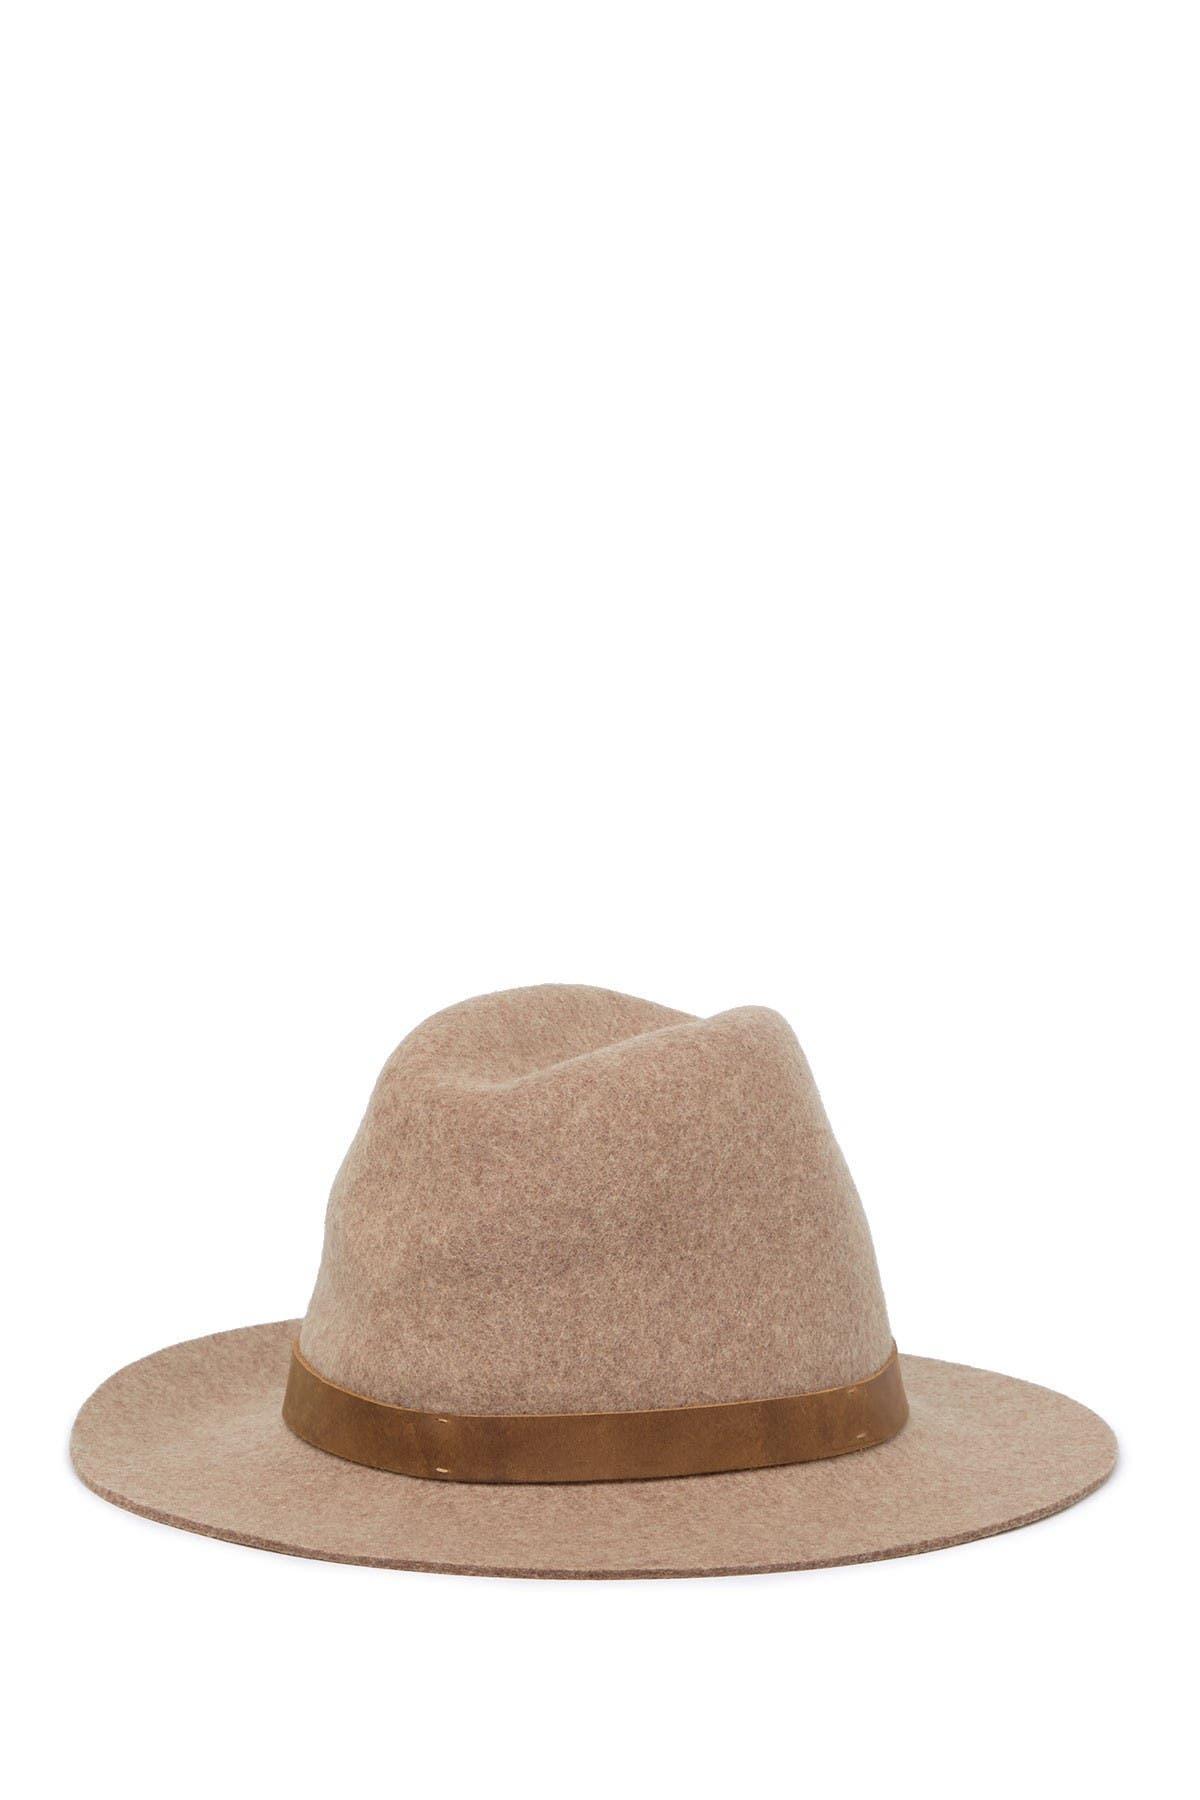 Image of Frye Tall Crown Felt Fedora Hat